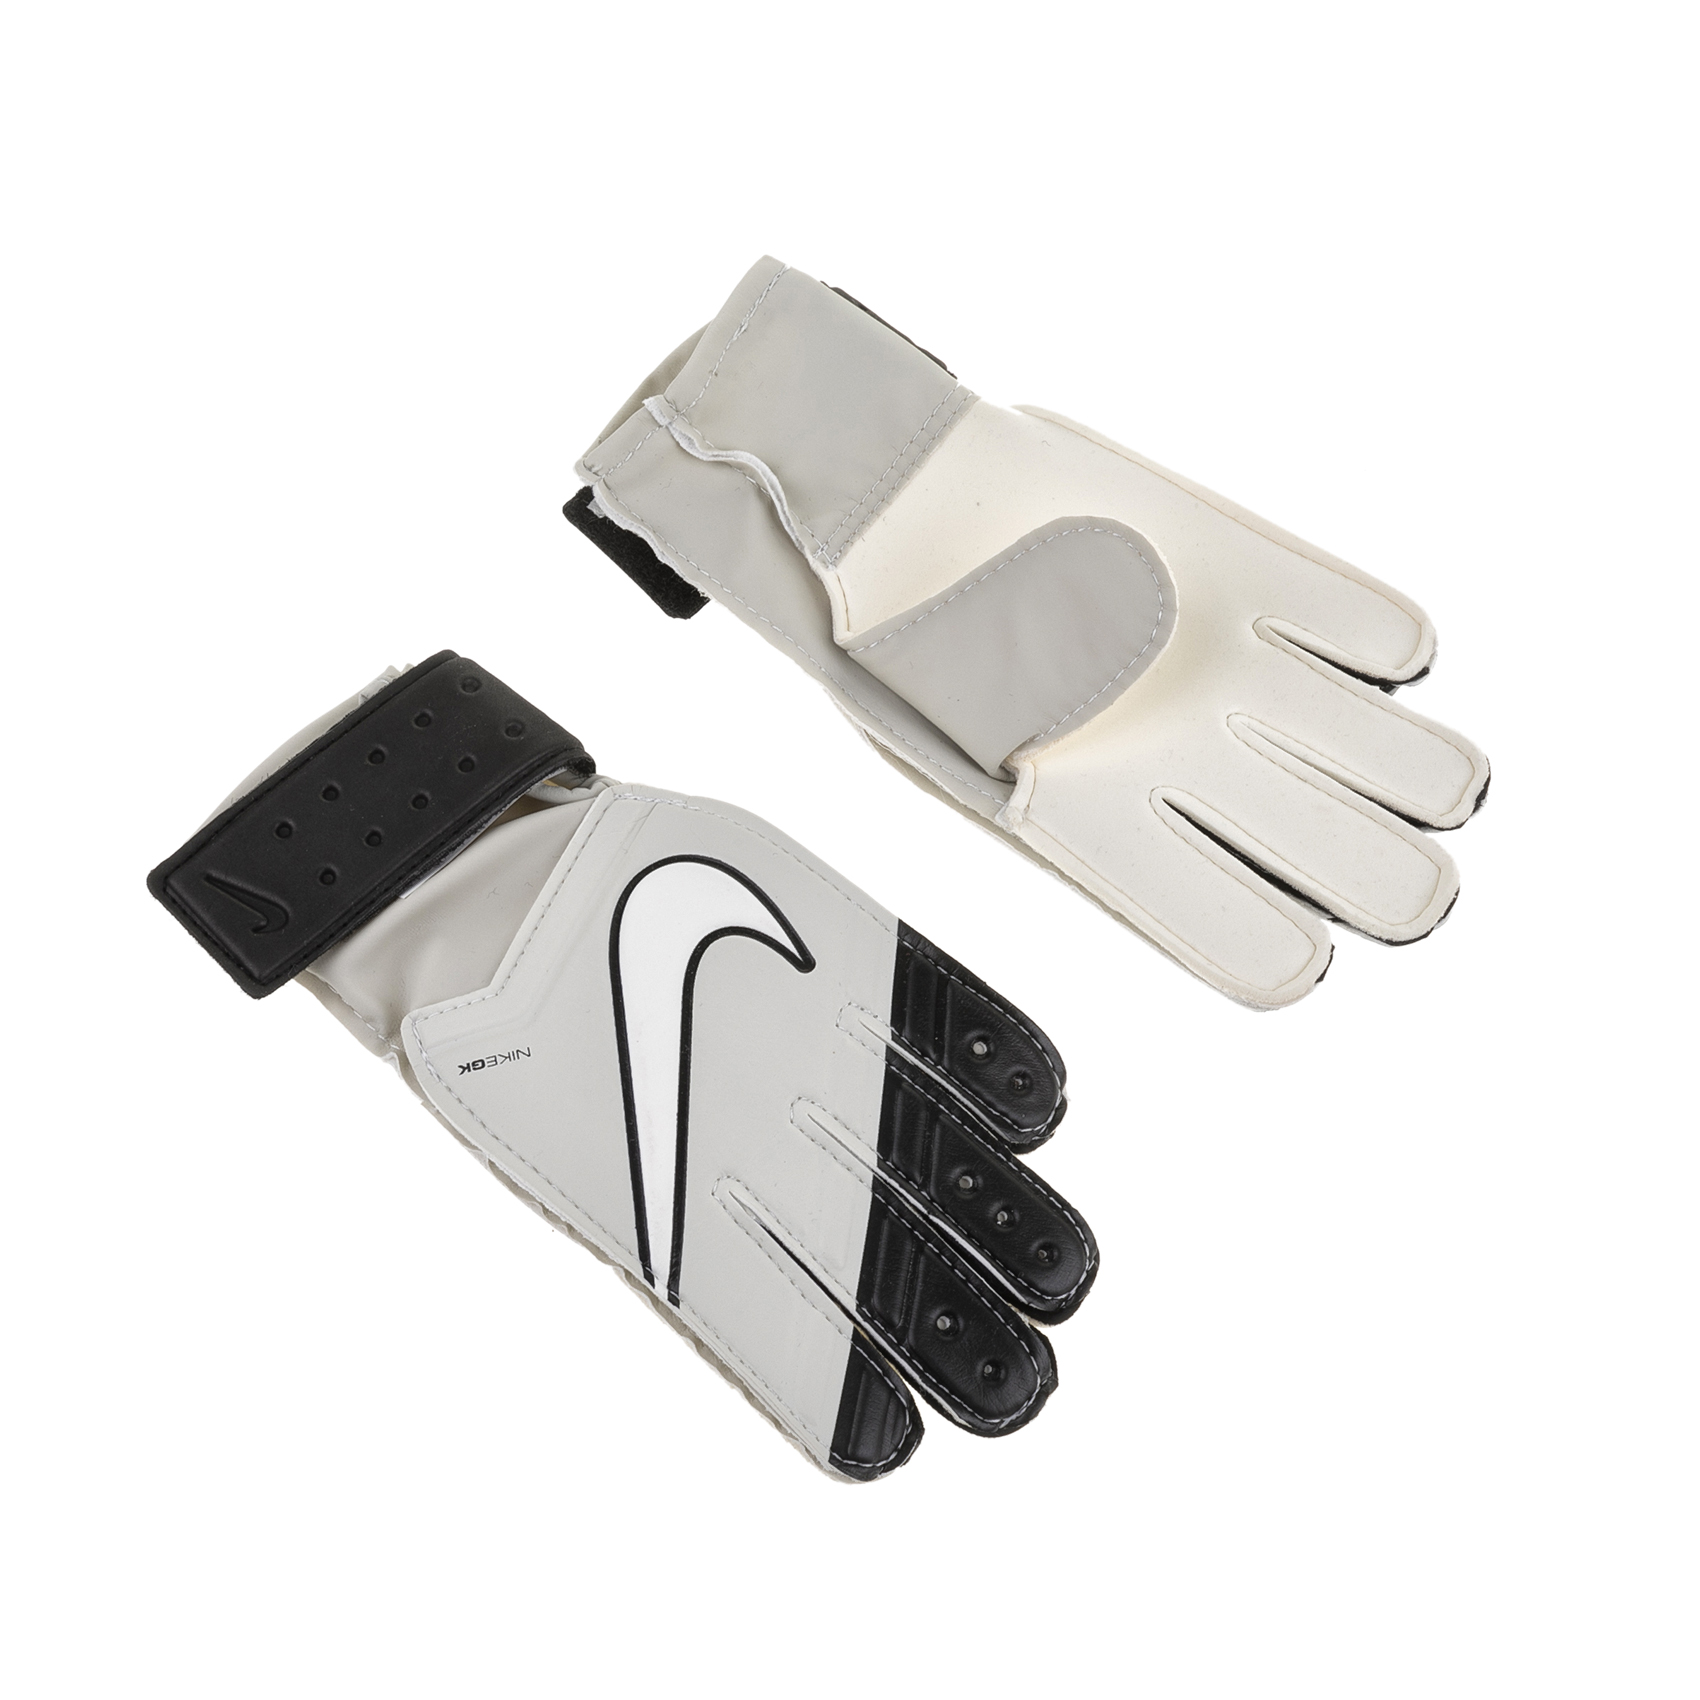 NIKE – Παιδικά γάντια τερματοφύλακα NIKE GK JR MATCH ΓΑΝΤΙΑ γκρι-μαύρα